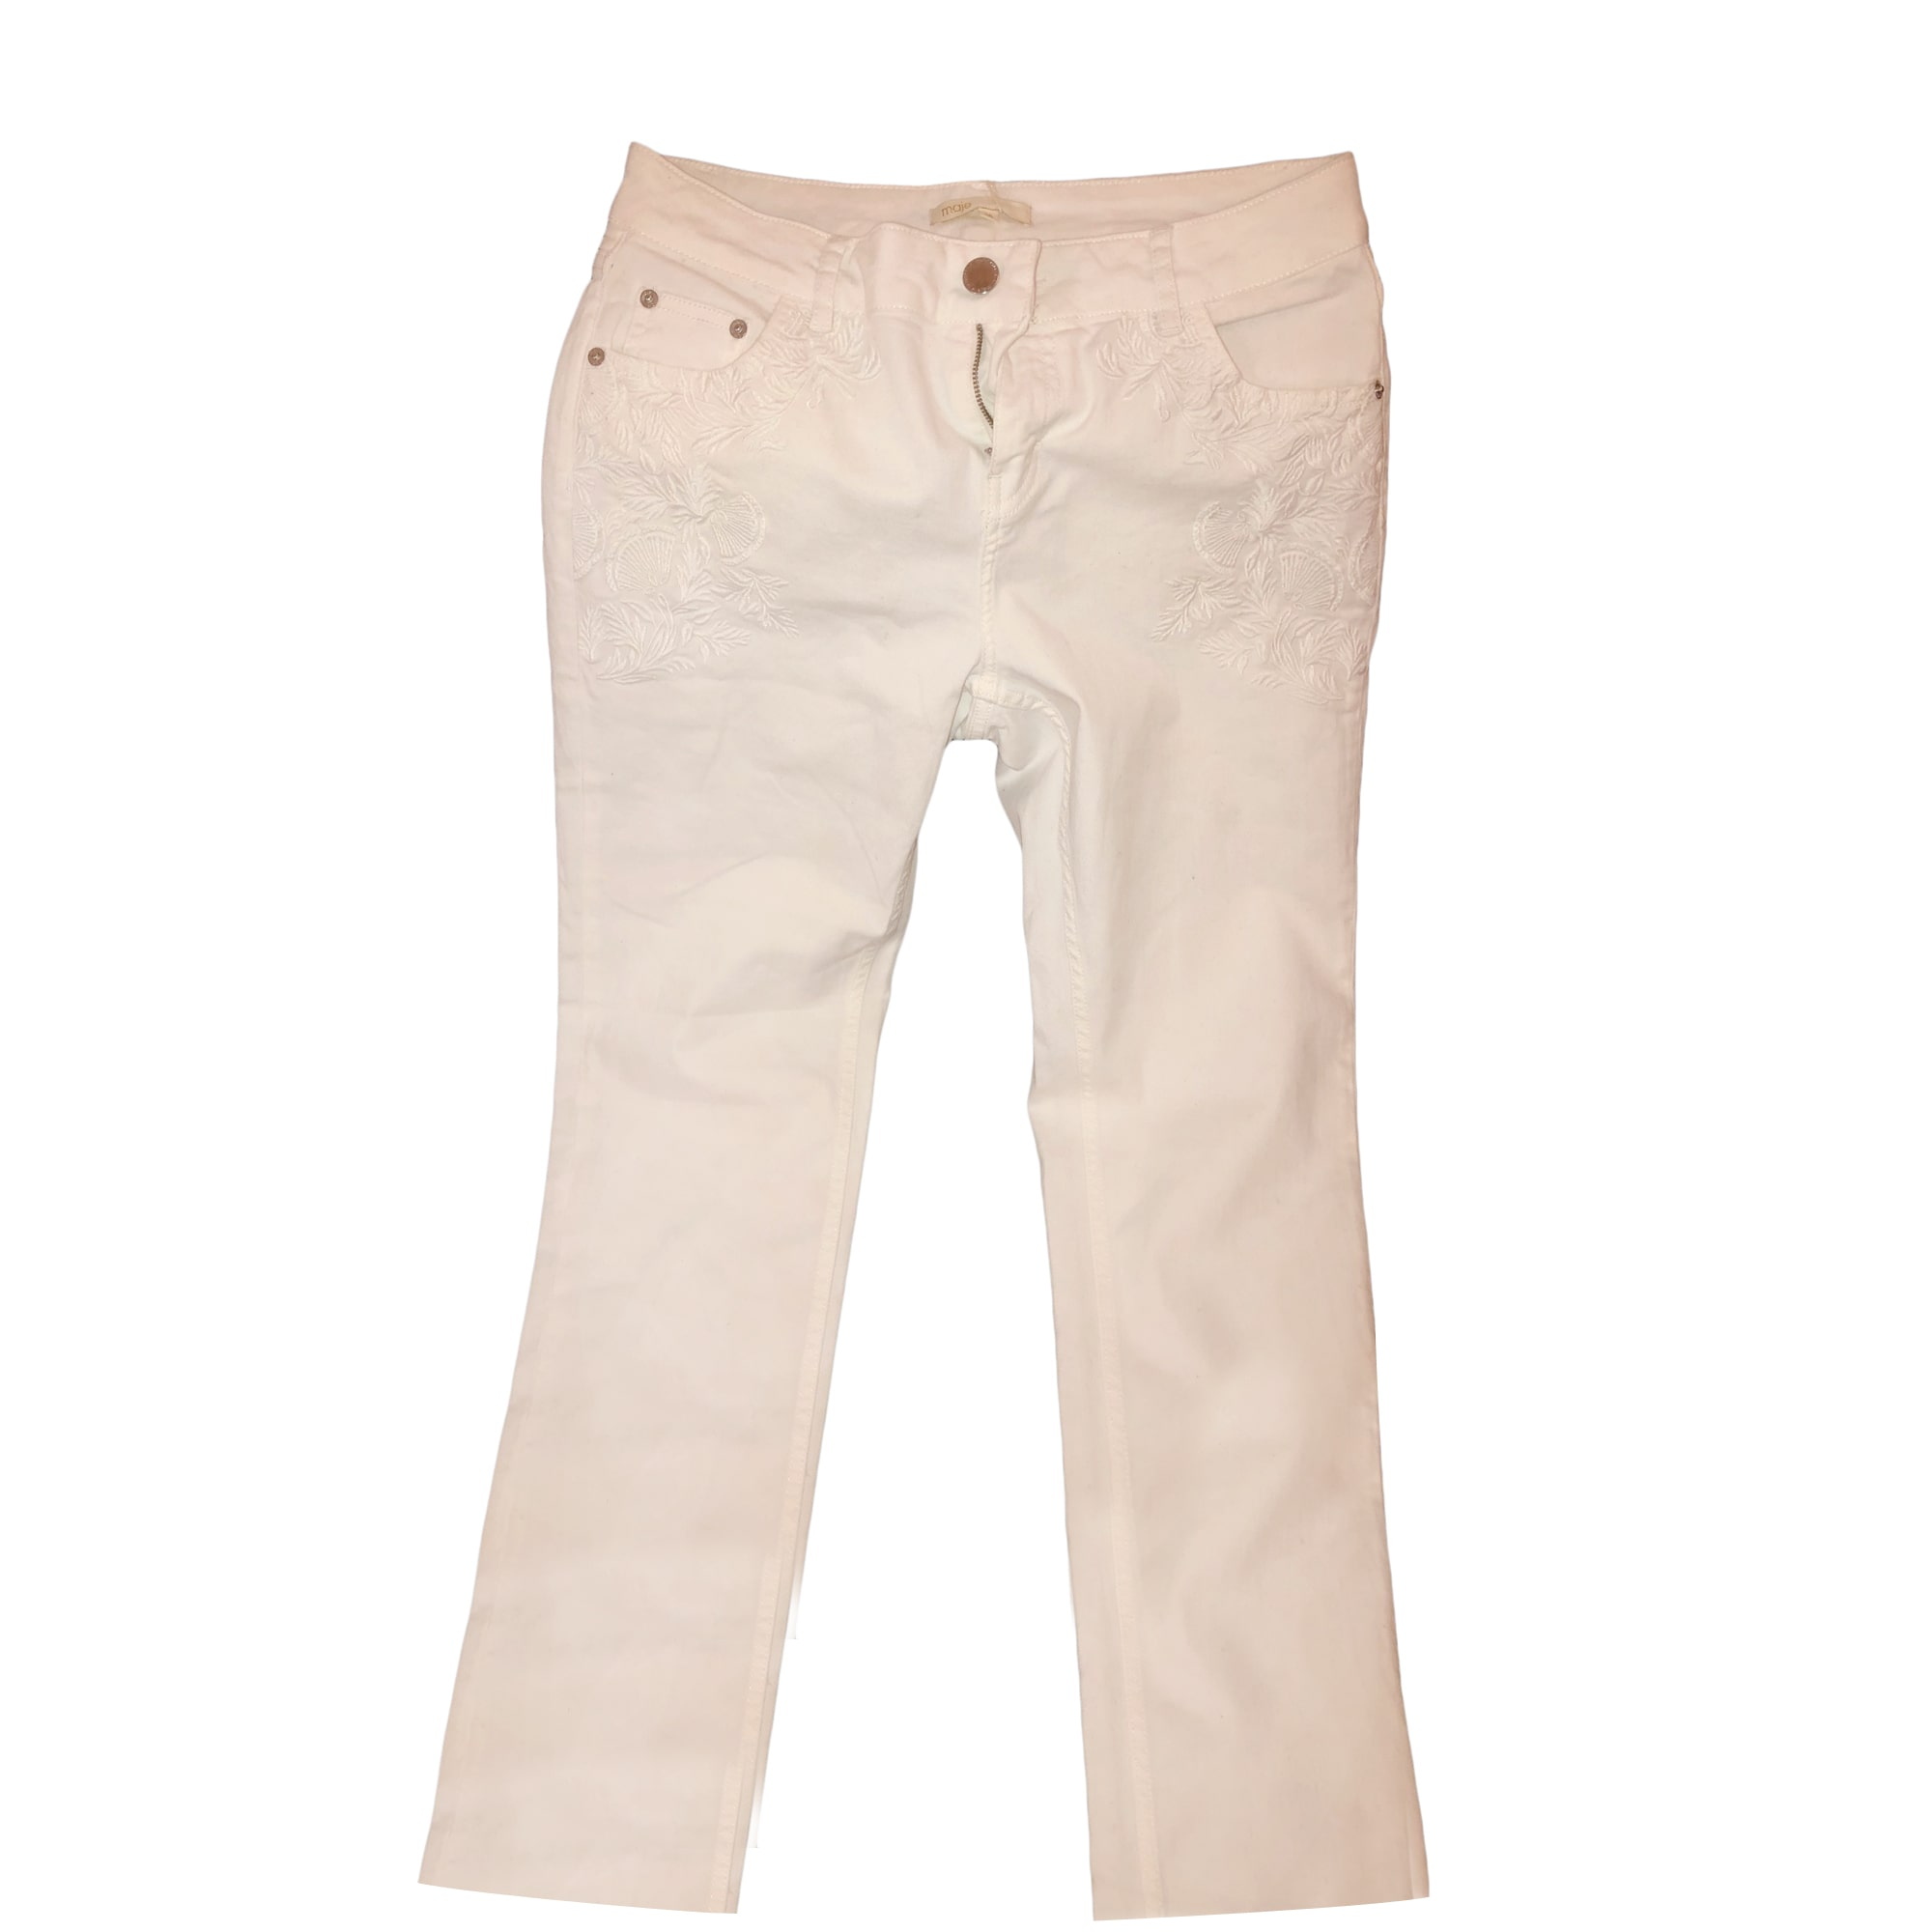 Jeans dritto MAJE Bianco, bianco sporco, ecru